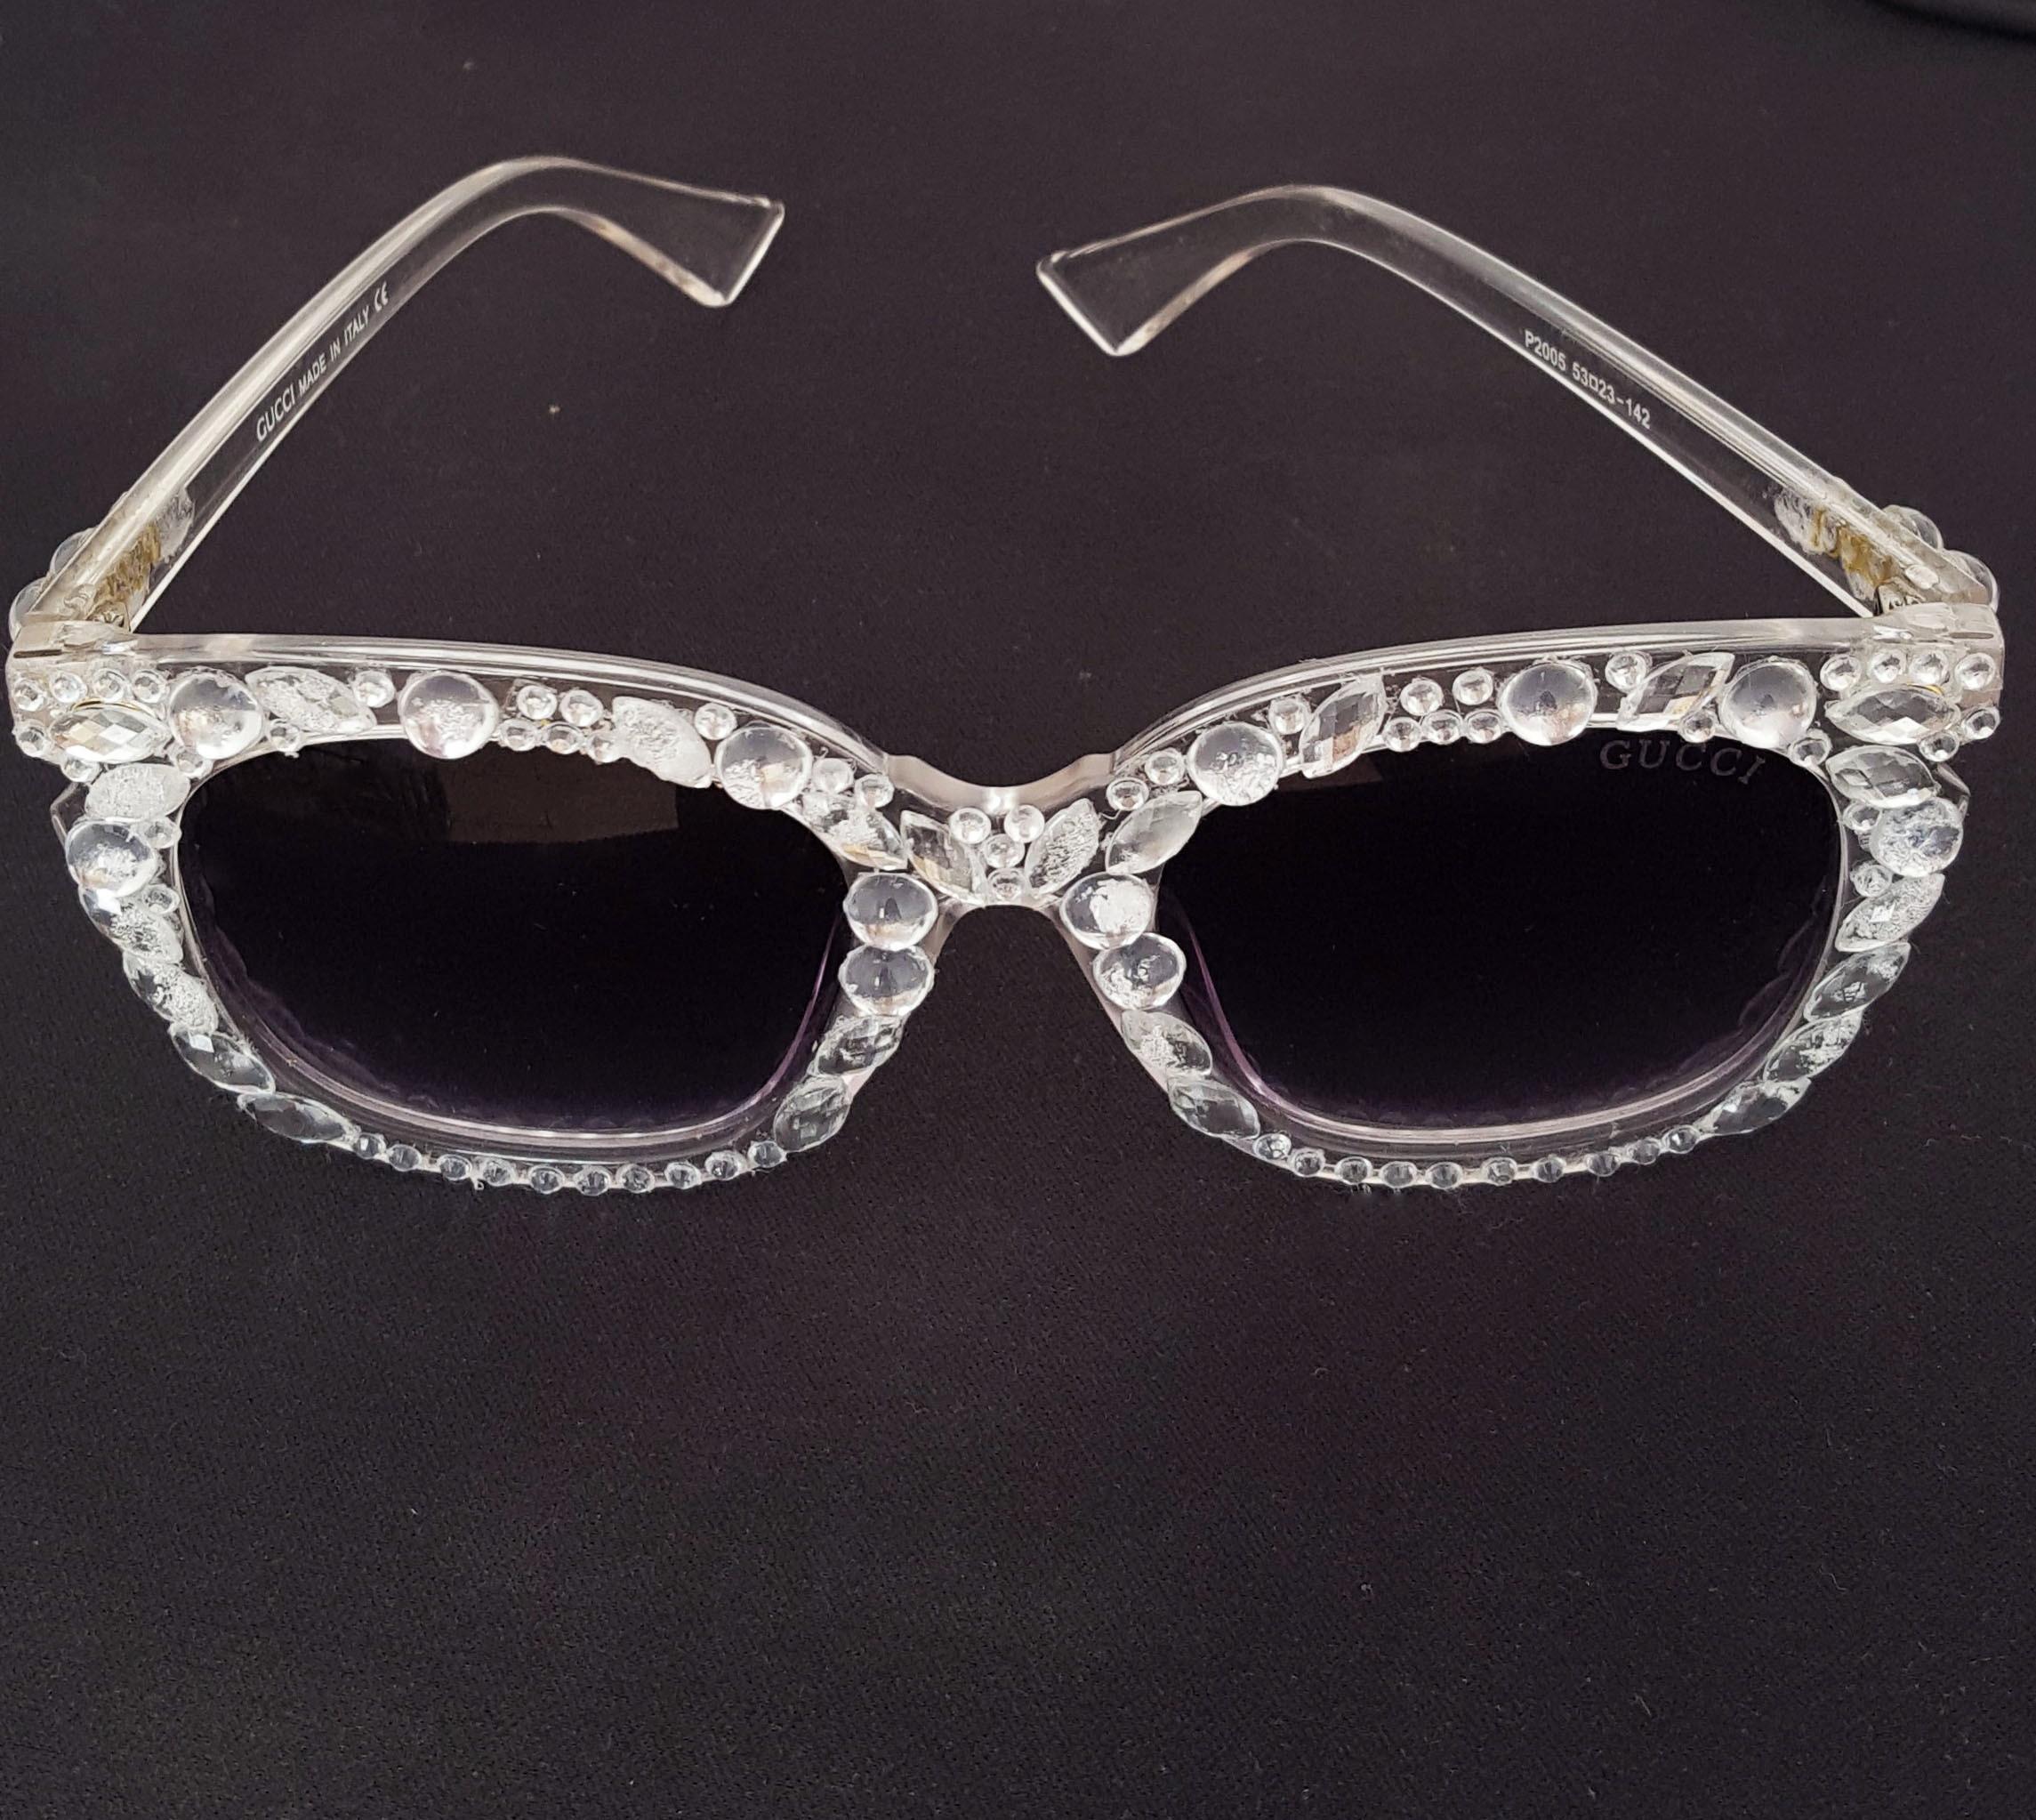 de84fa433f4e0 Oculos Carnaval Bruna